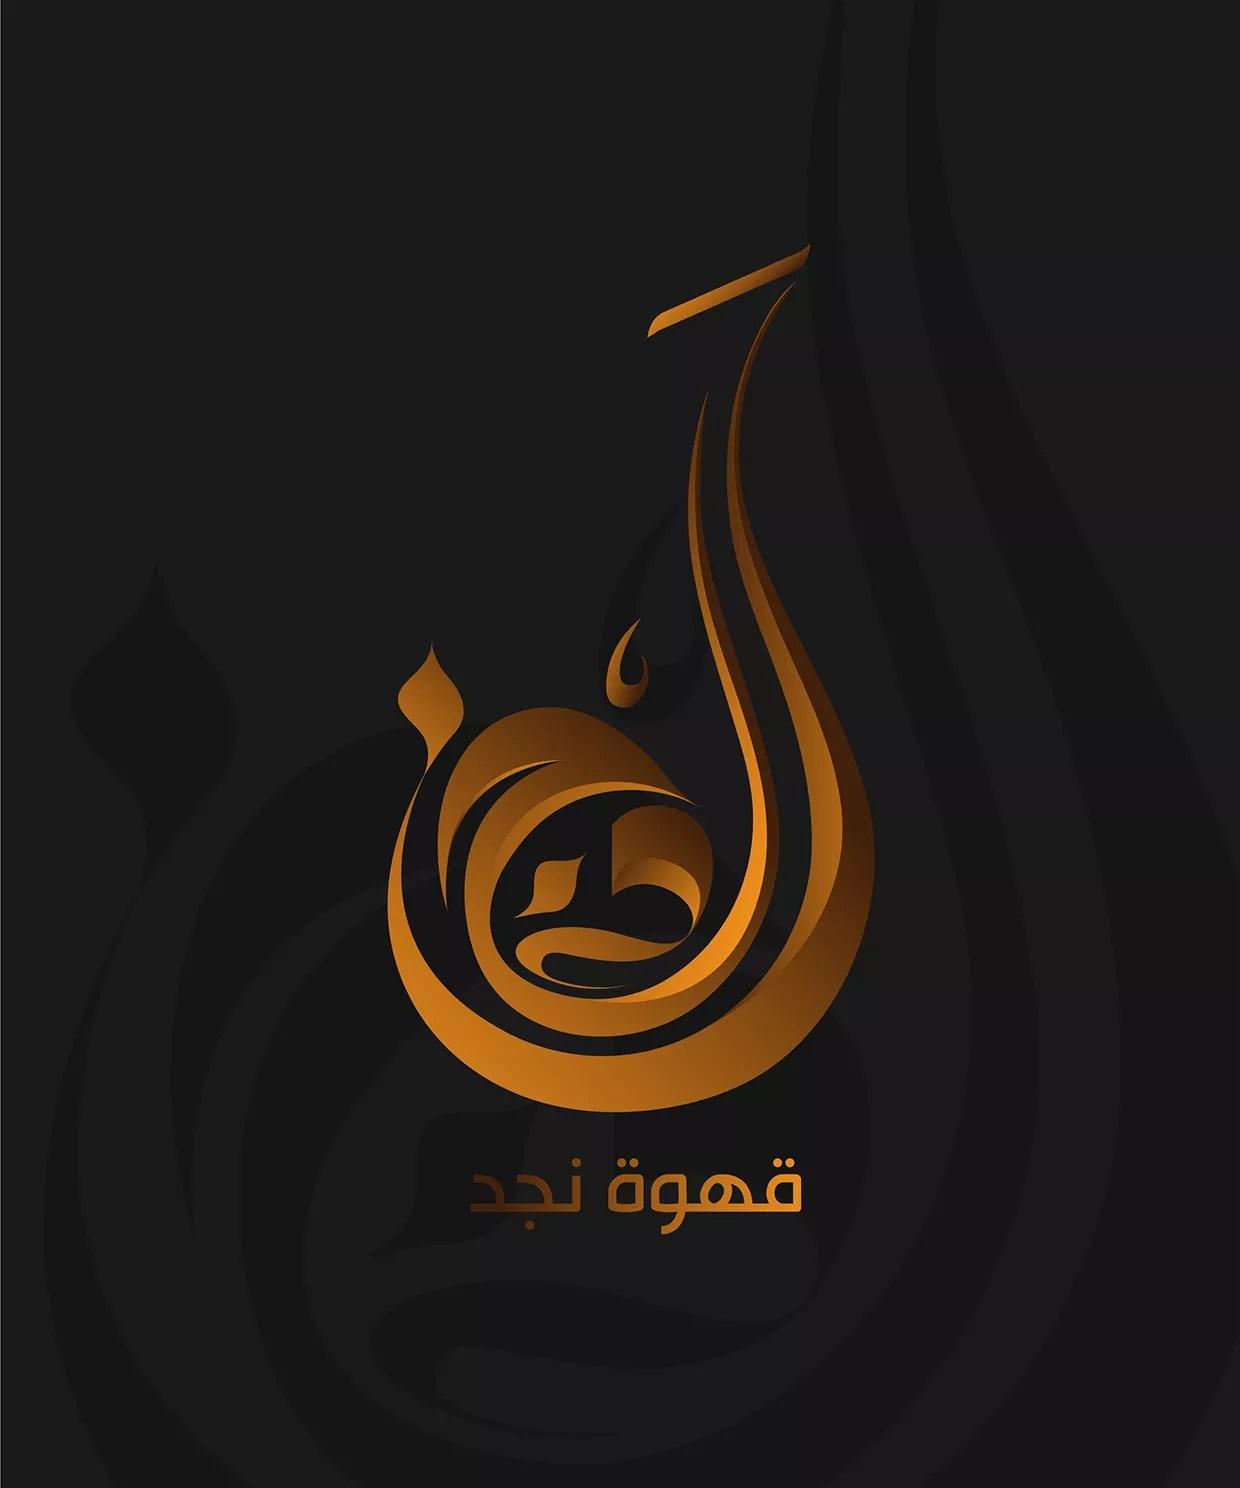 islamic-Arabic-Calligraphy-logo-design-example-26